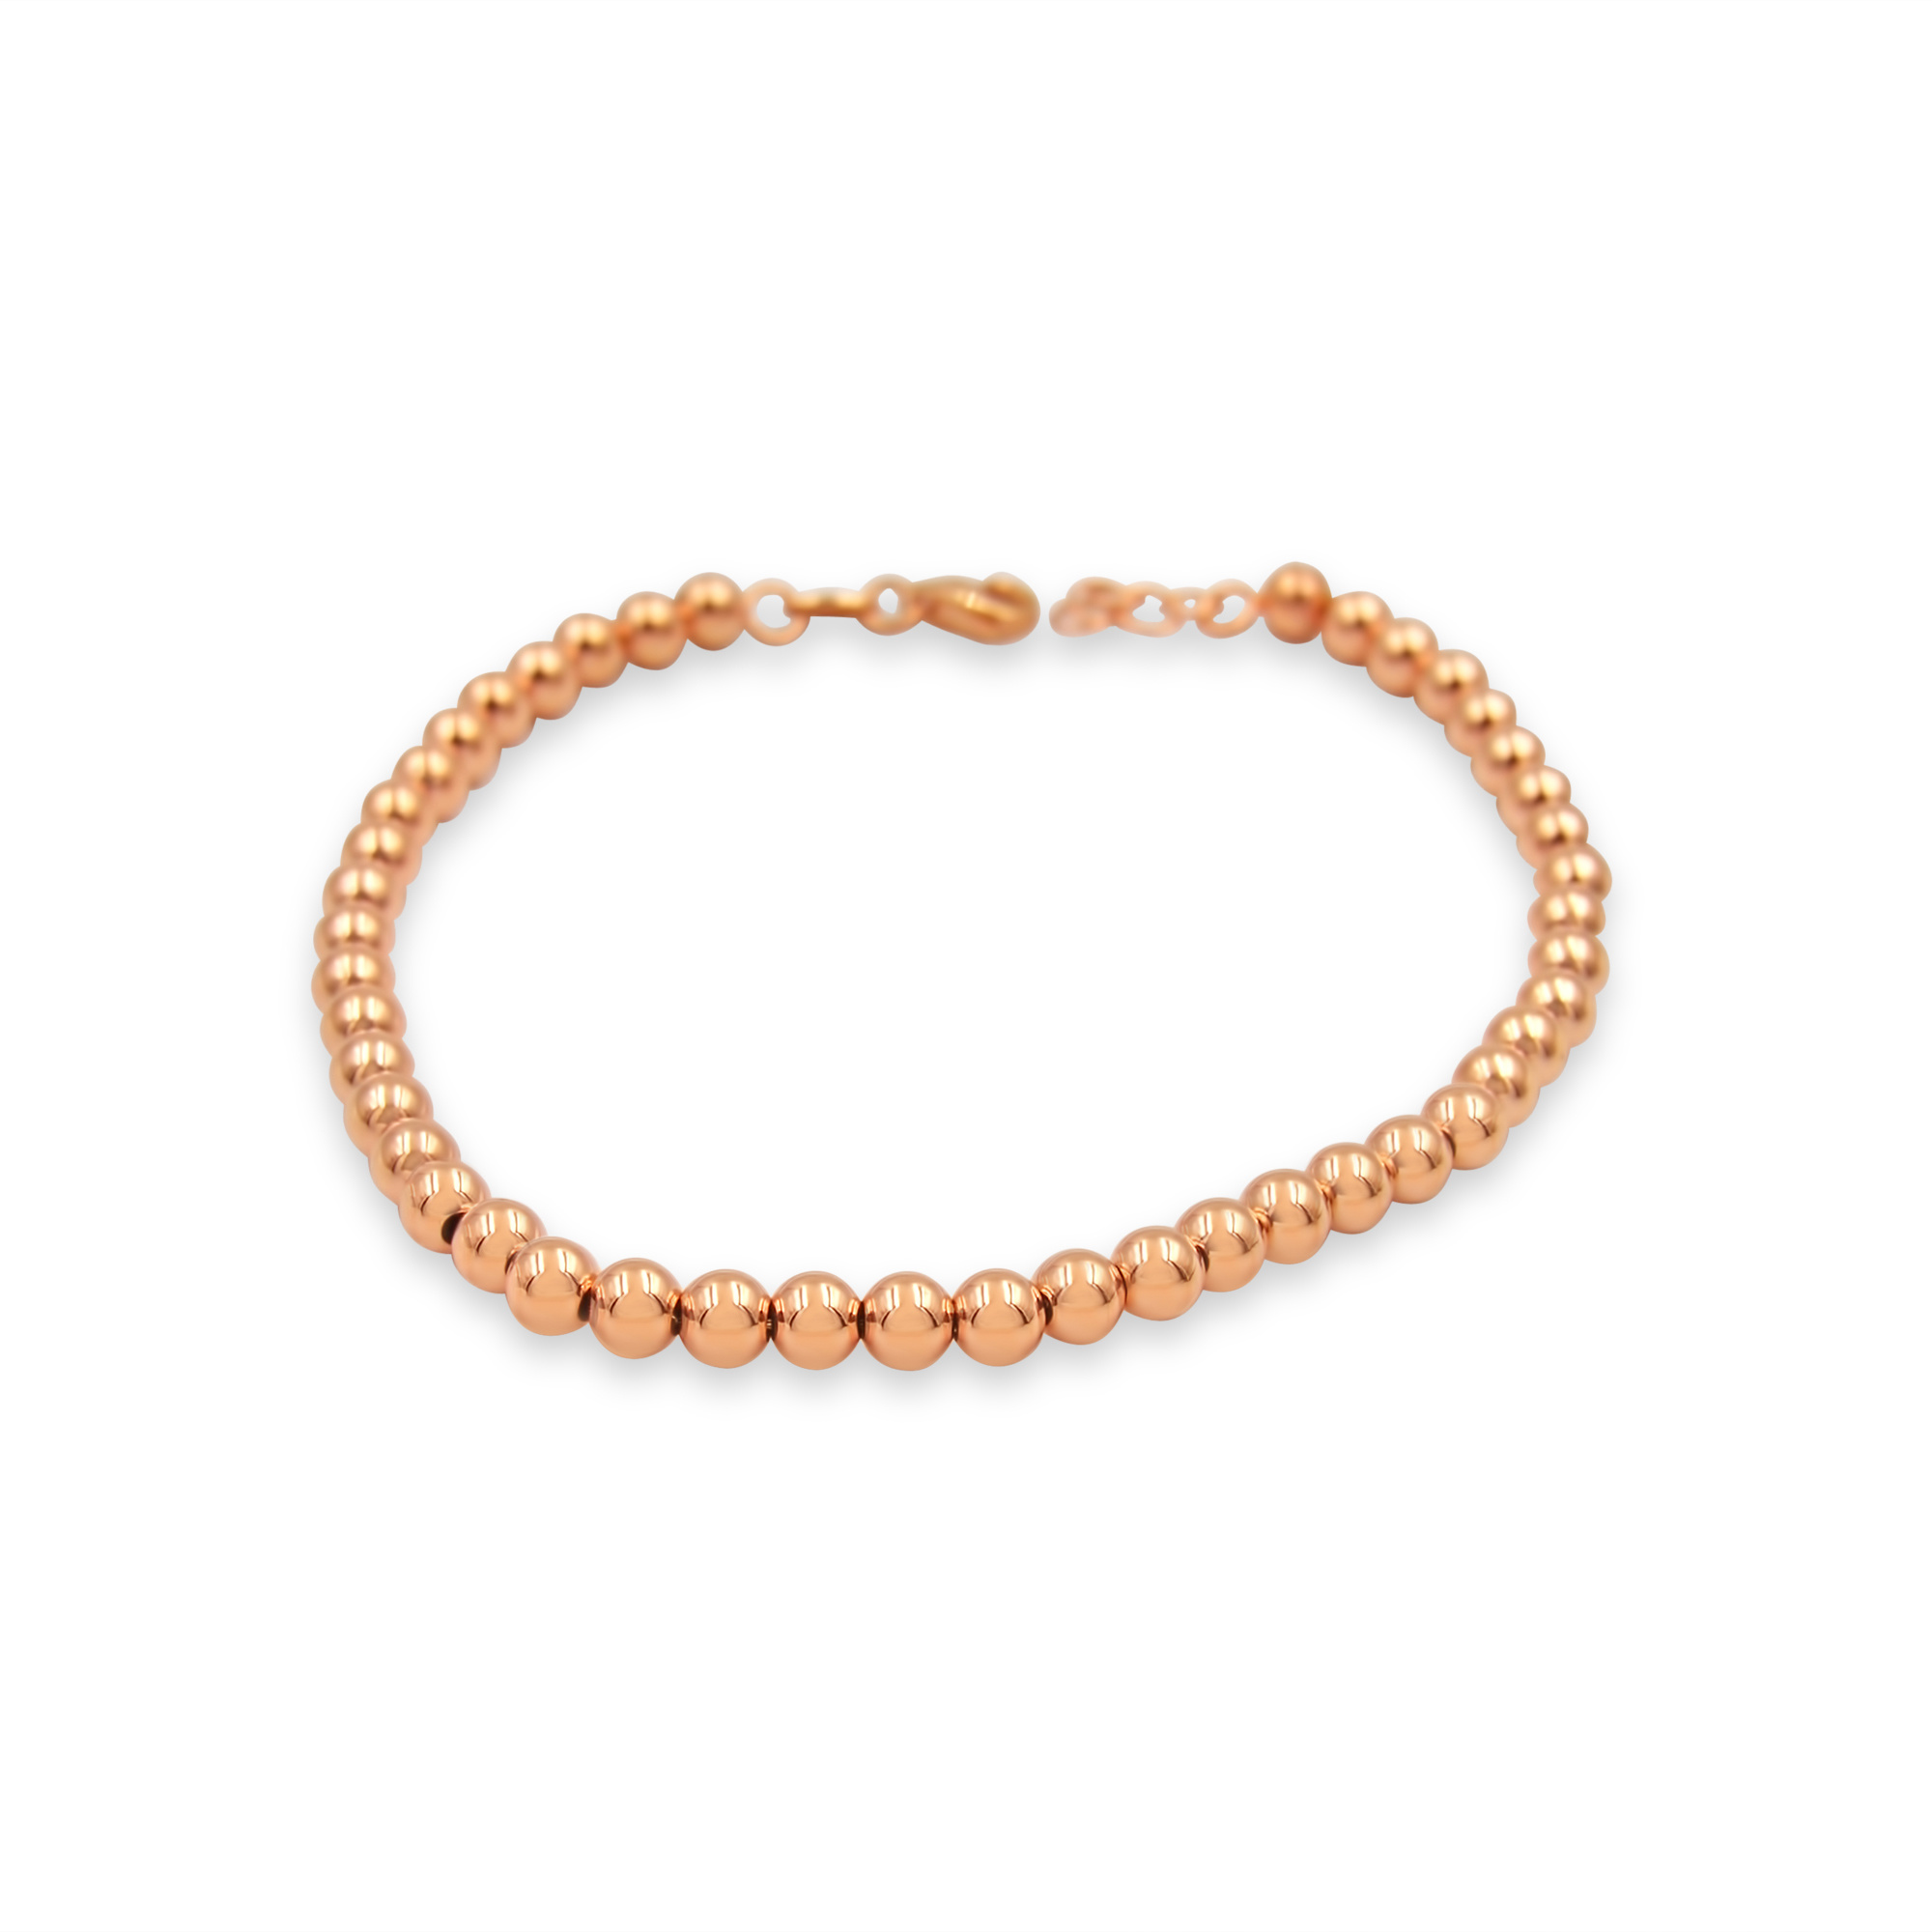 18 kt rose gold balls bracelet unisex